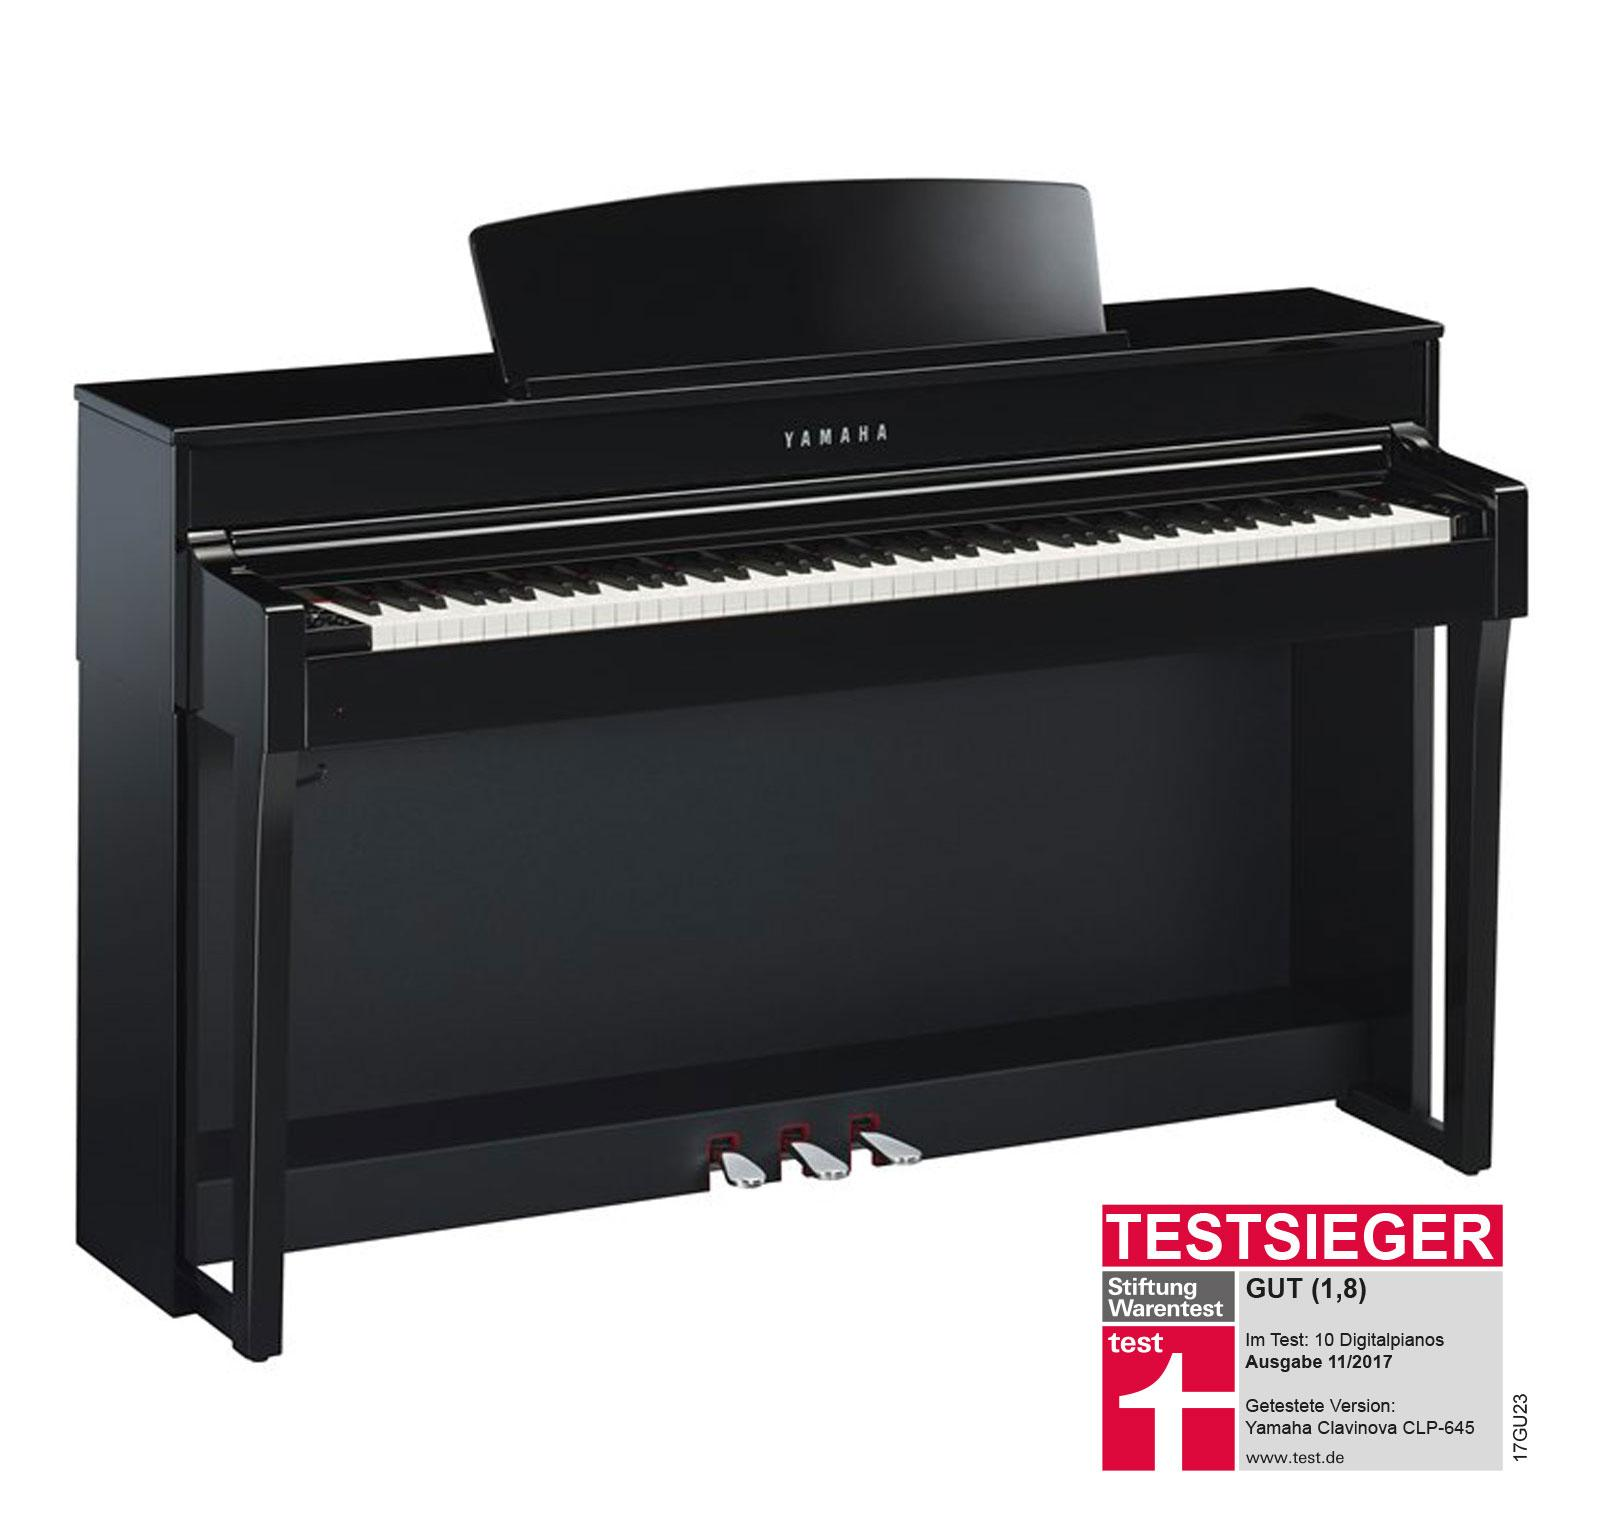 Yamaha CLP 645 PE Digitalpiano schwarz hochglanz